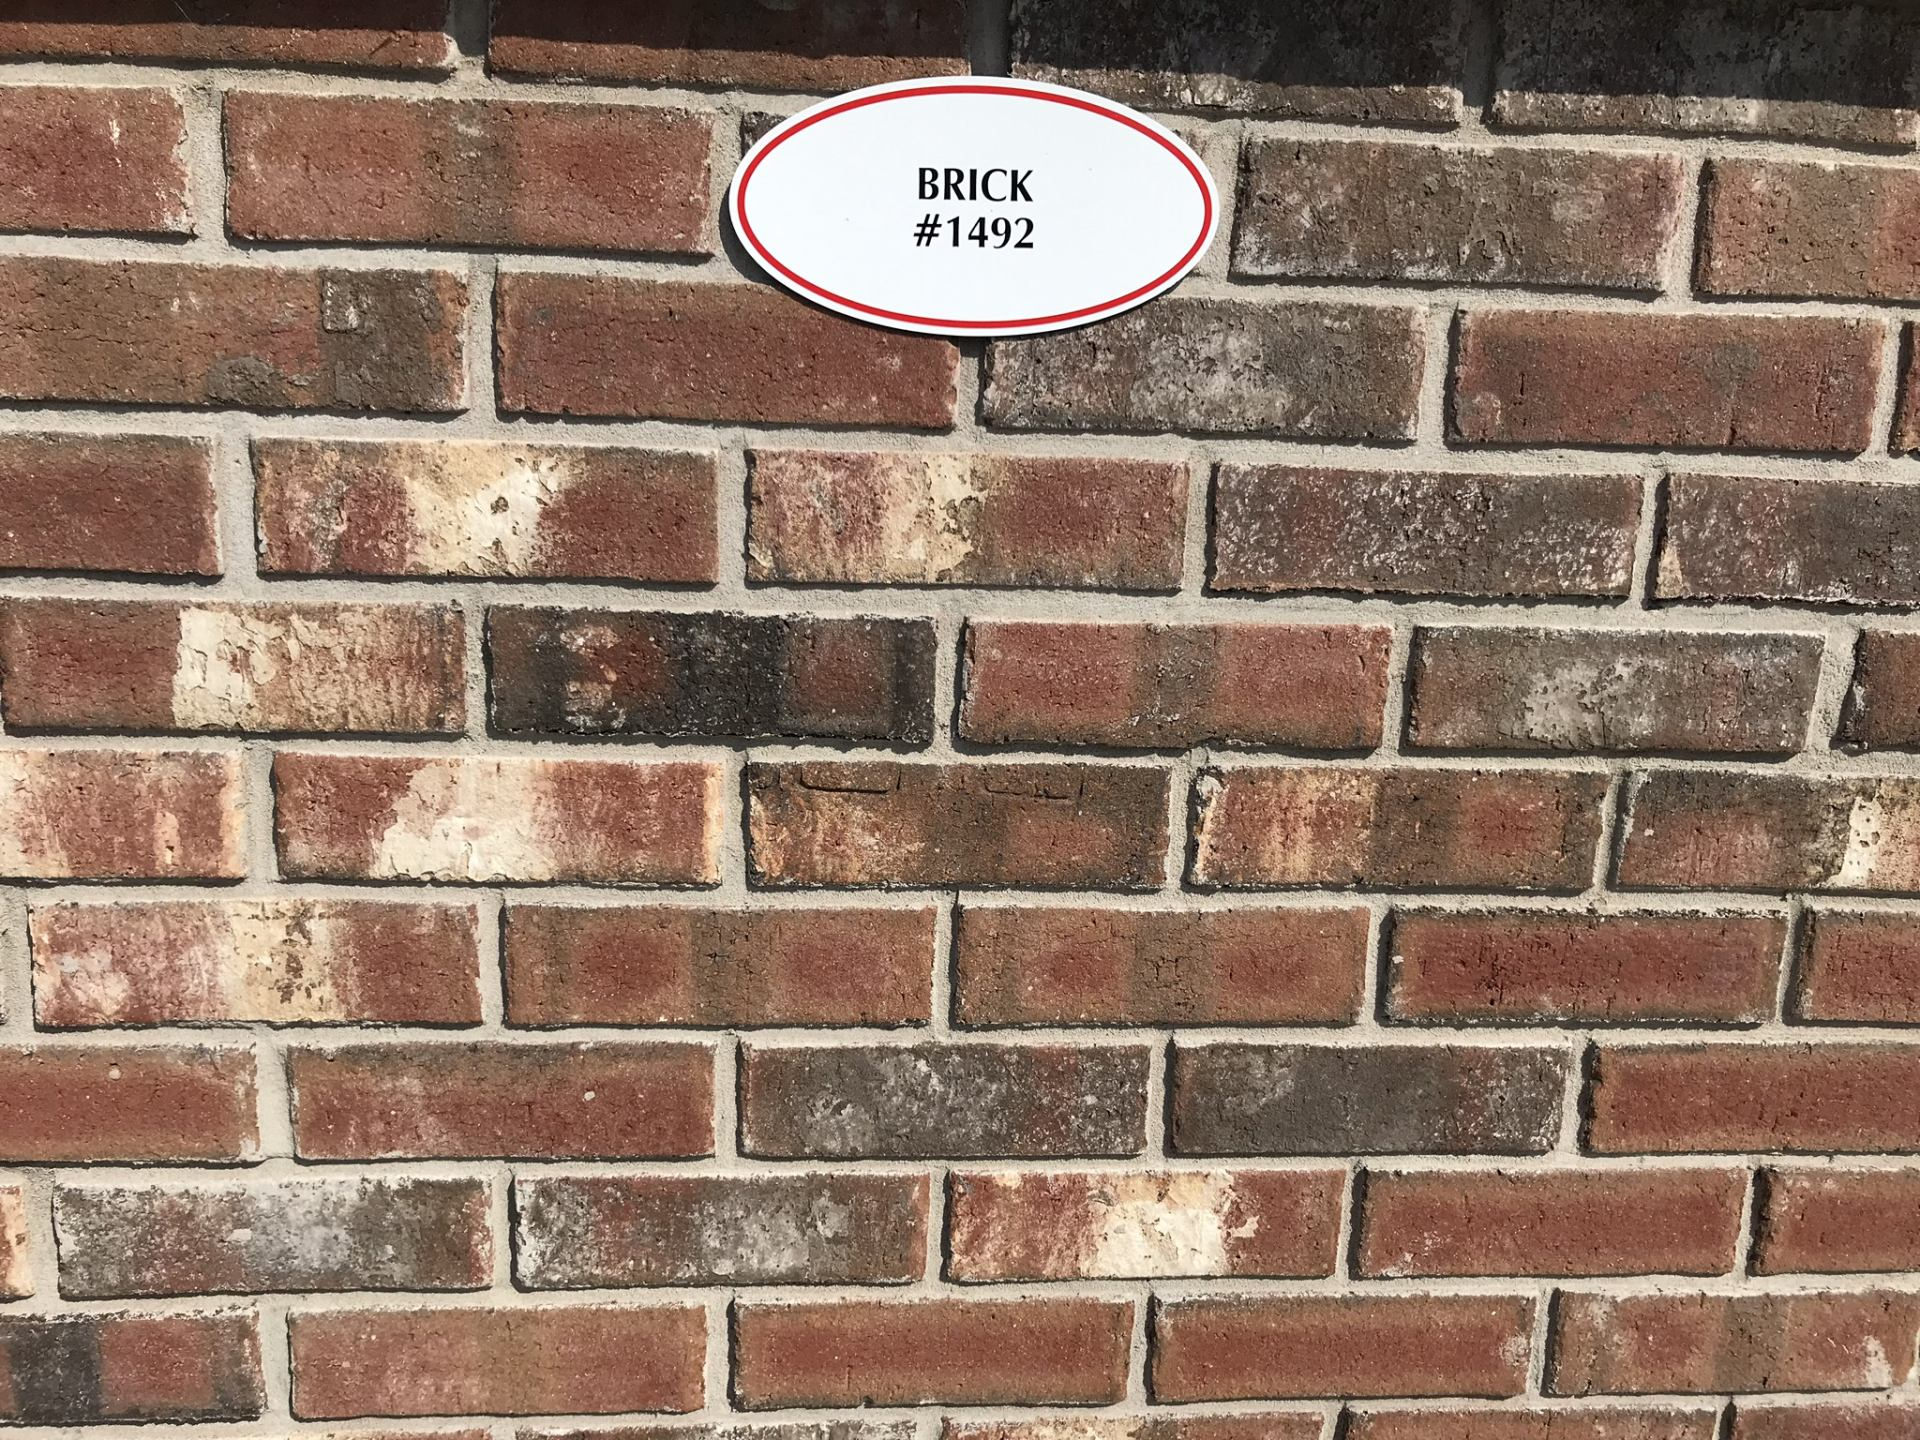 Brick #1492